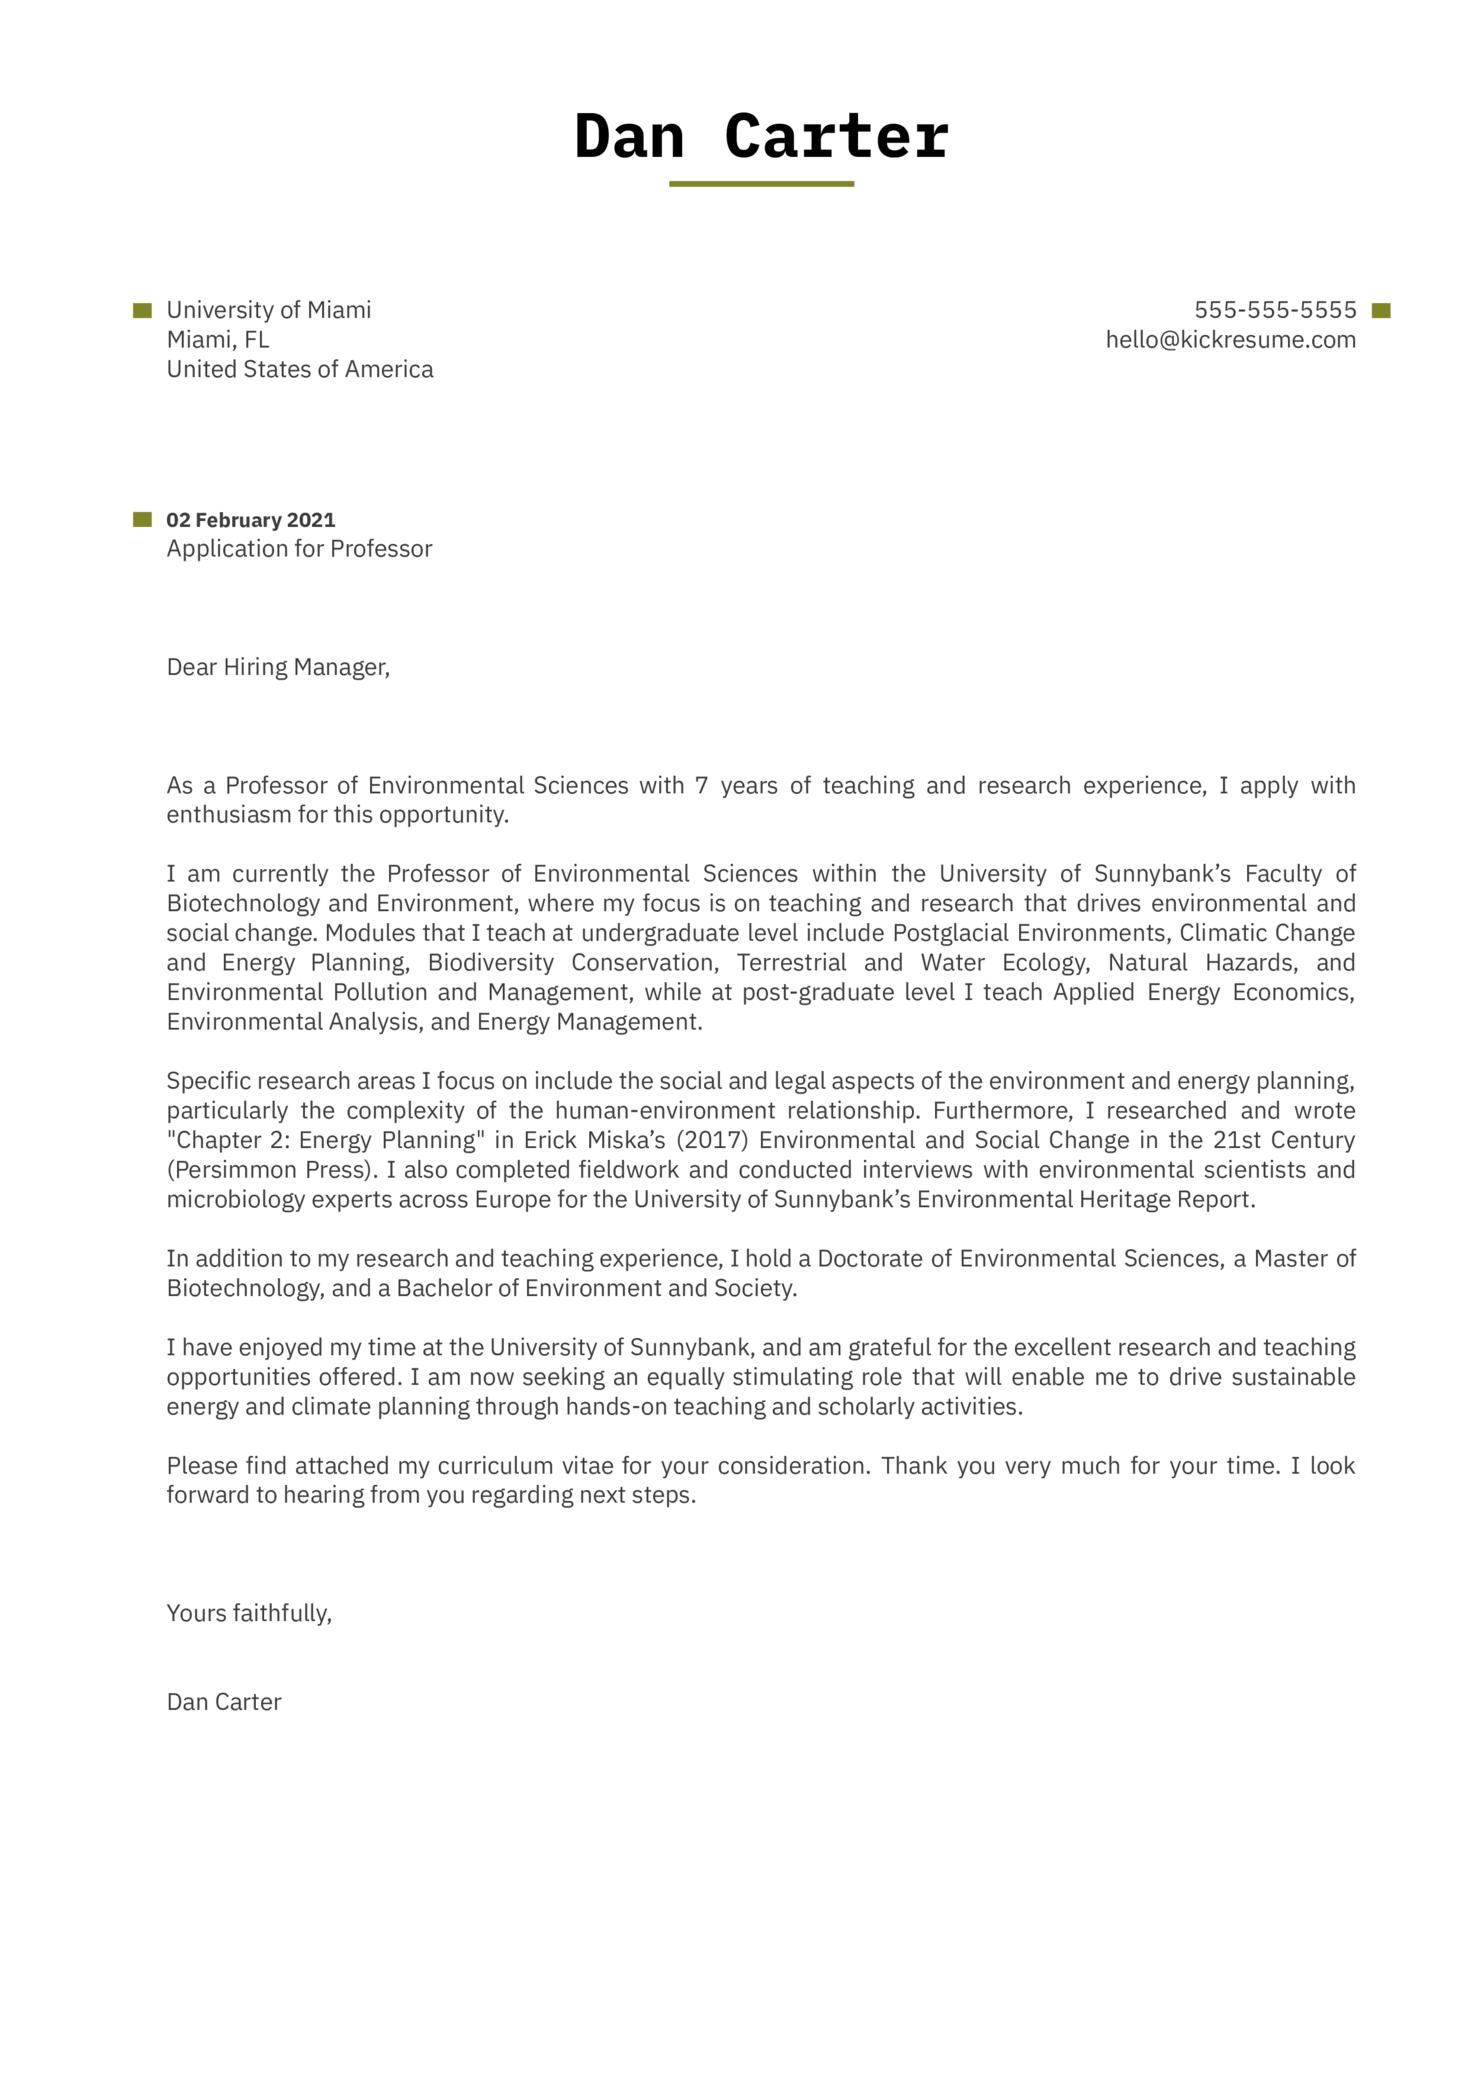 Professor Cover Letter Template